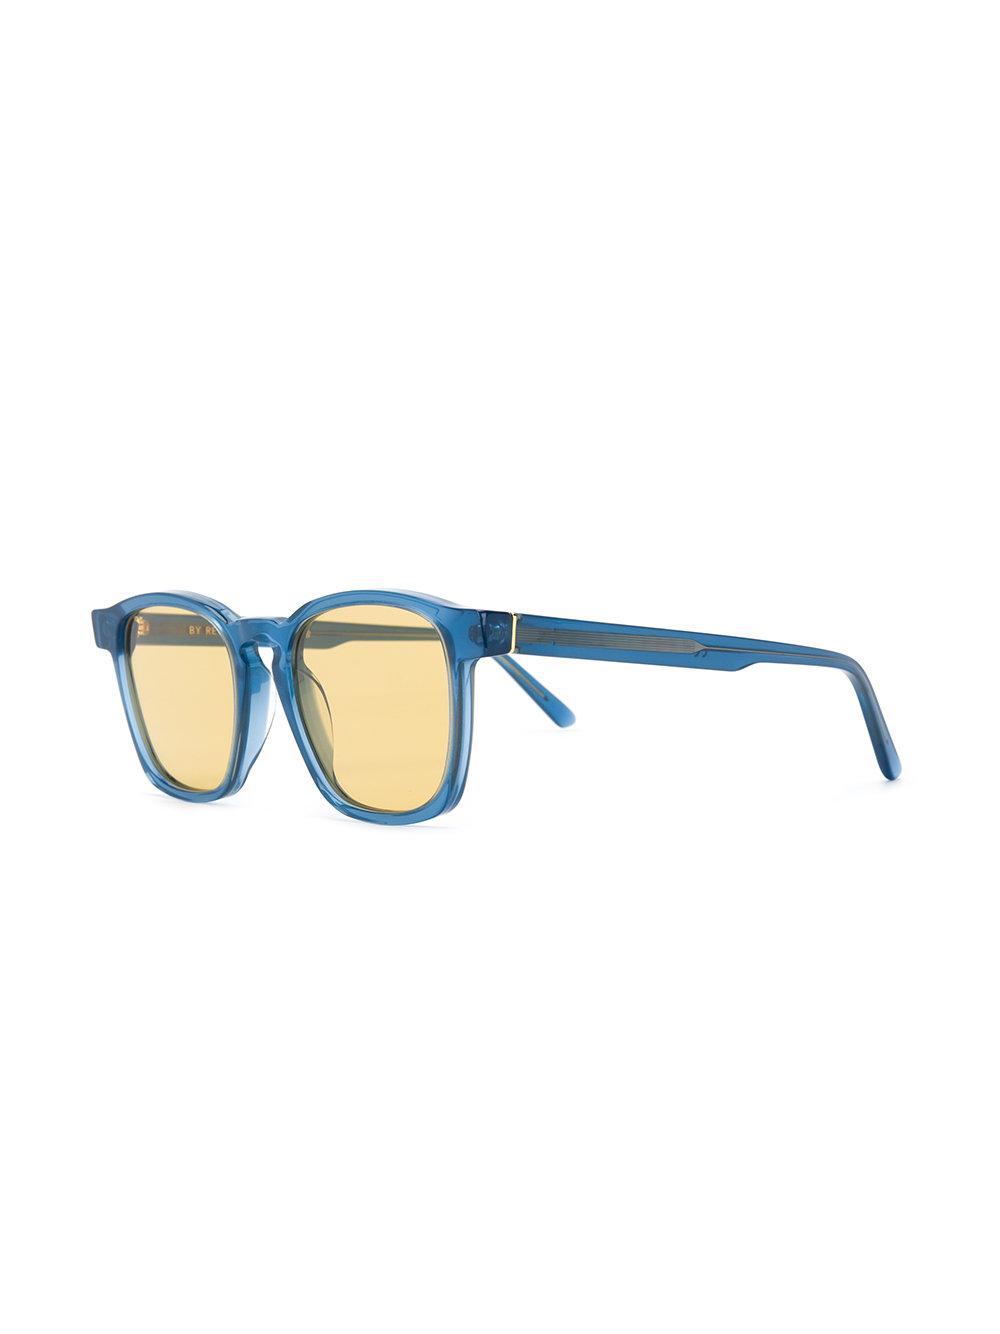 26a671fb8268 Retrosuperfuture - Blue Unico Square Sunglasses - Lyst. View fullscreen